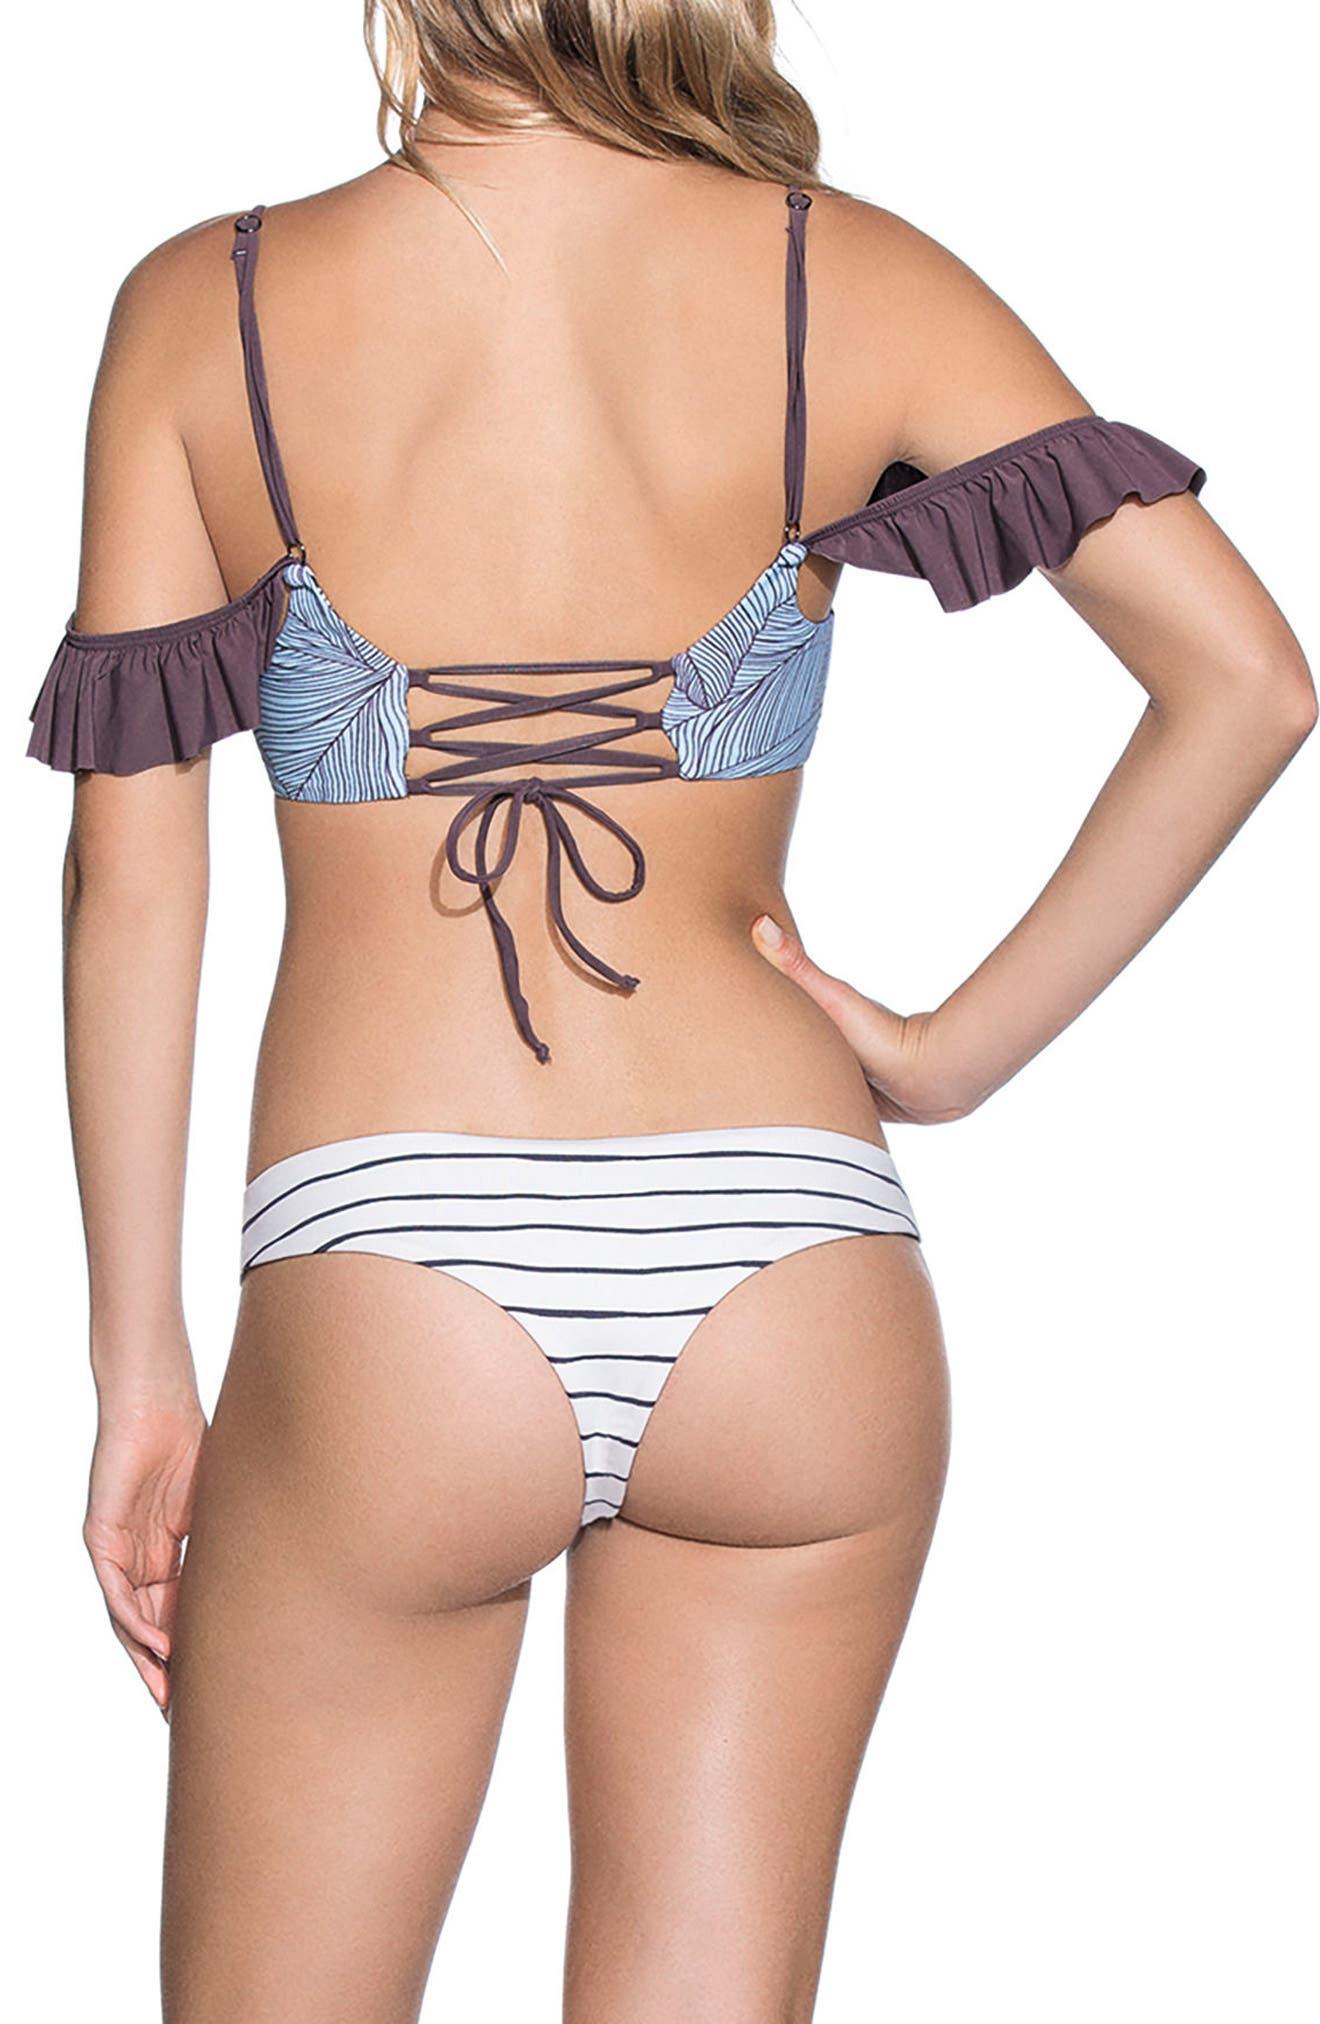 Sierra Nevada Off the Shoulder Reversible Bikini Top,                             Alternate thumbnail 4, color,                             500